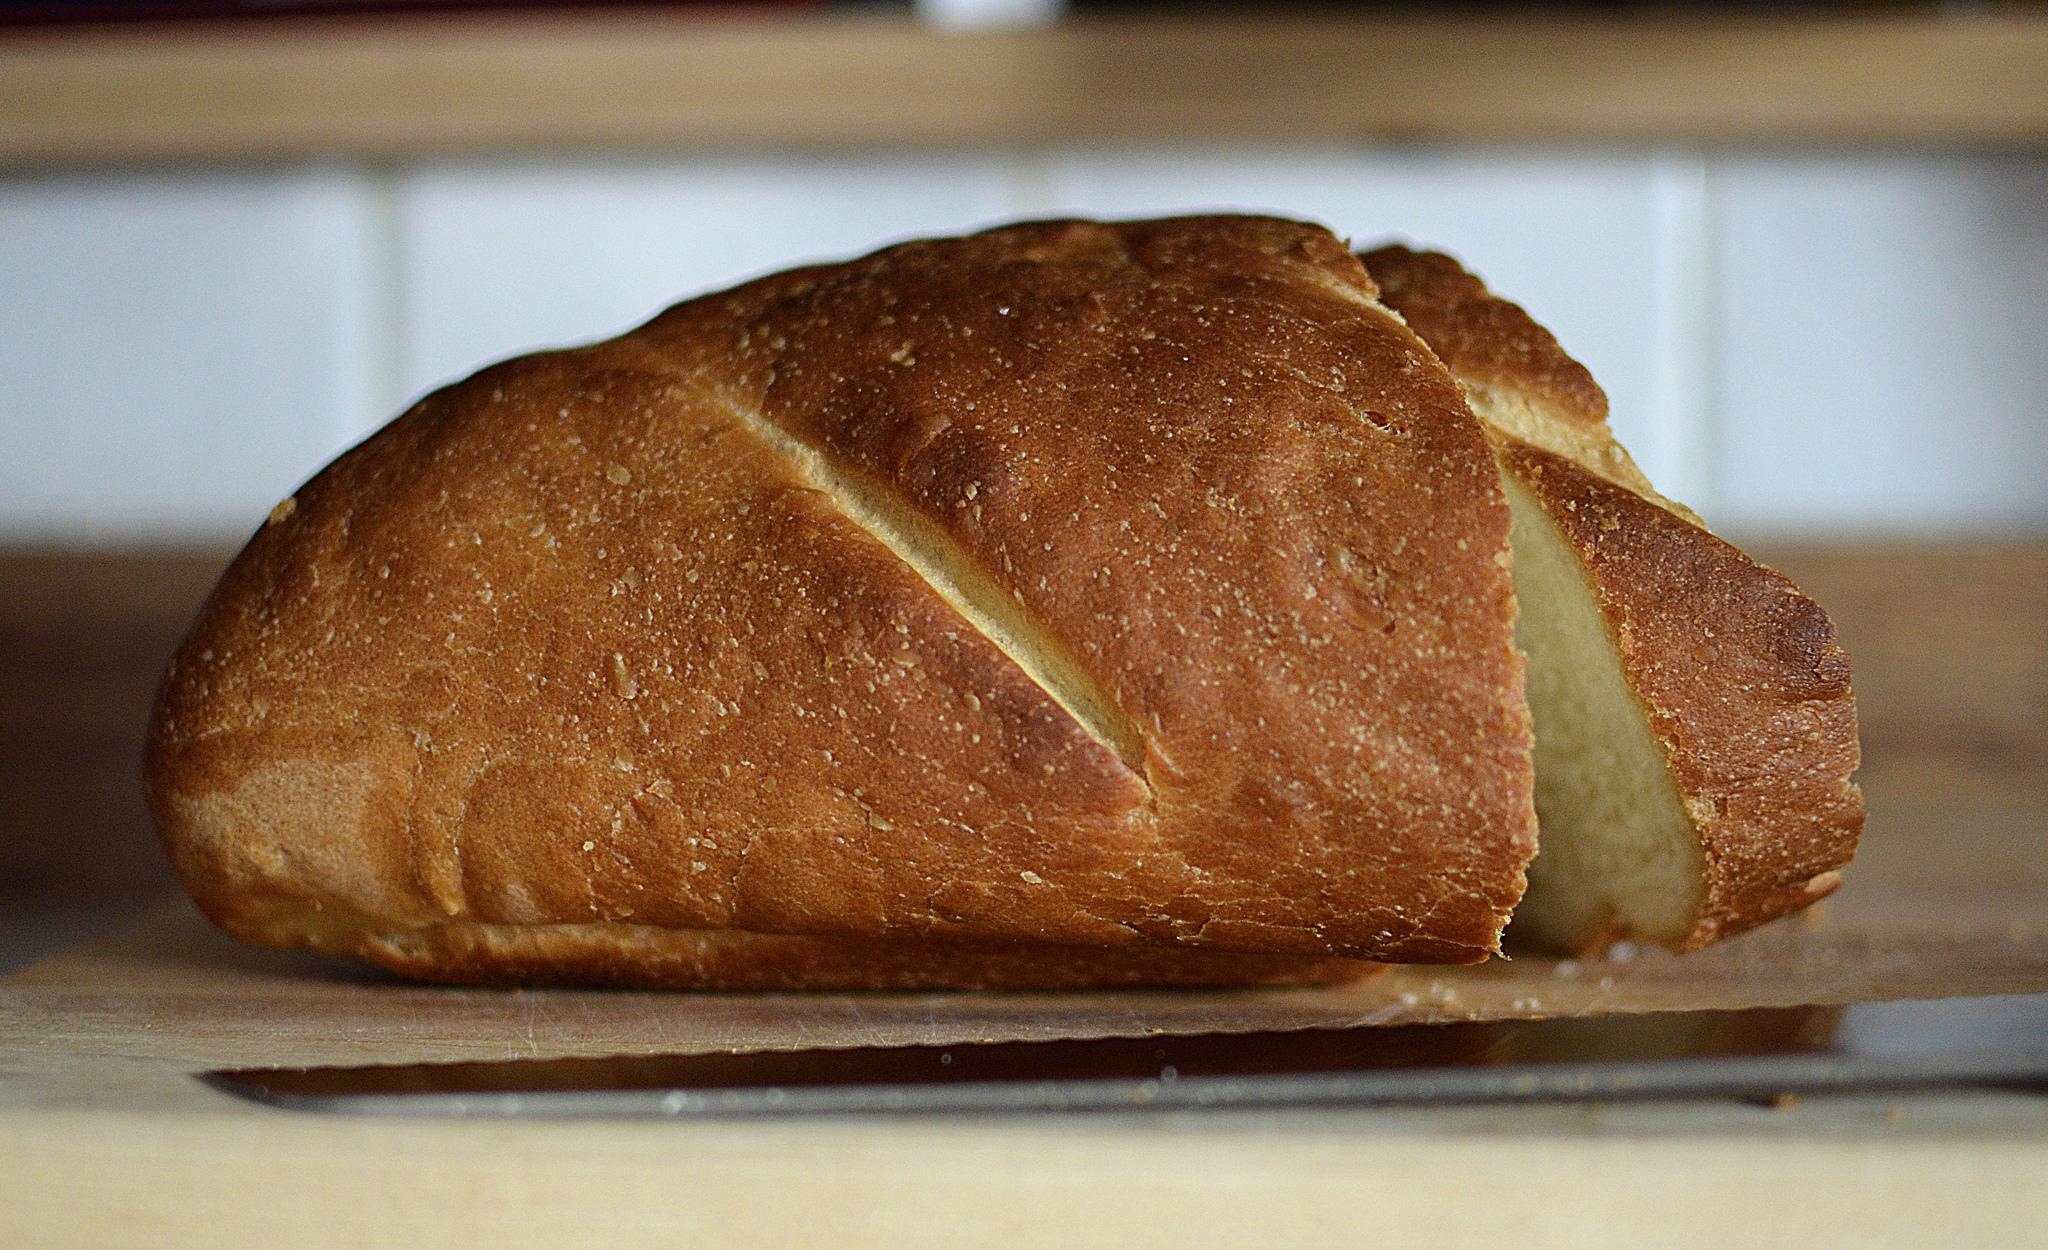 Bread | © M Dreibelbis/Flickr